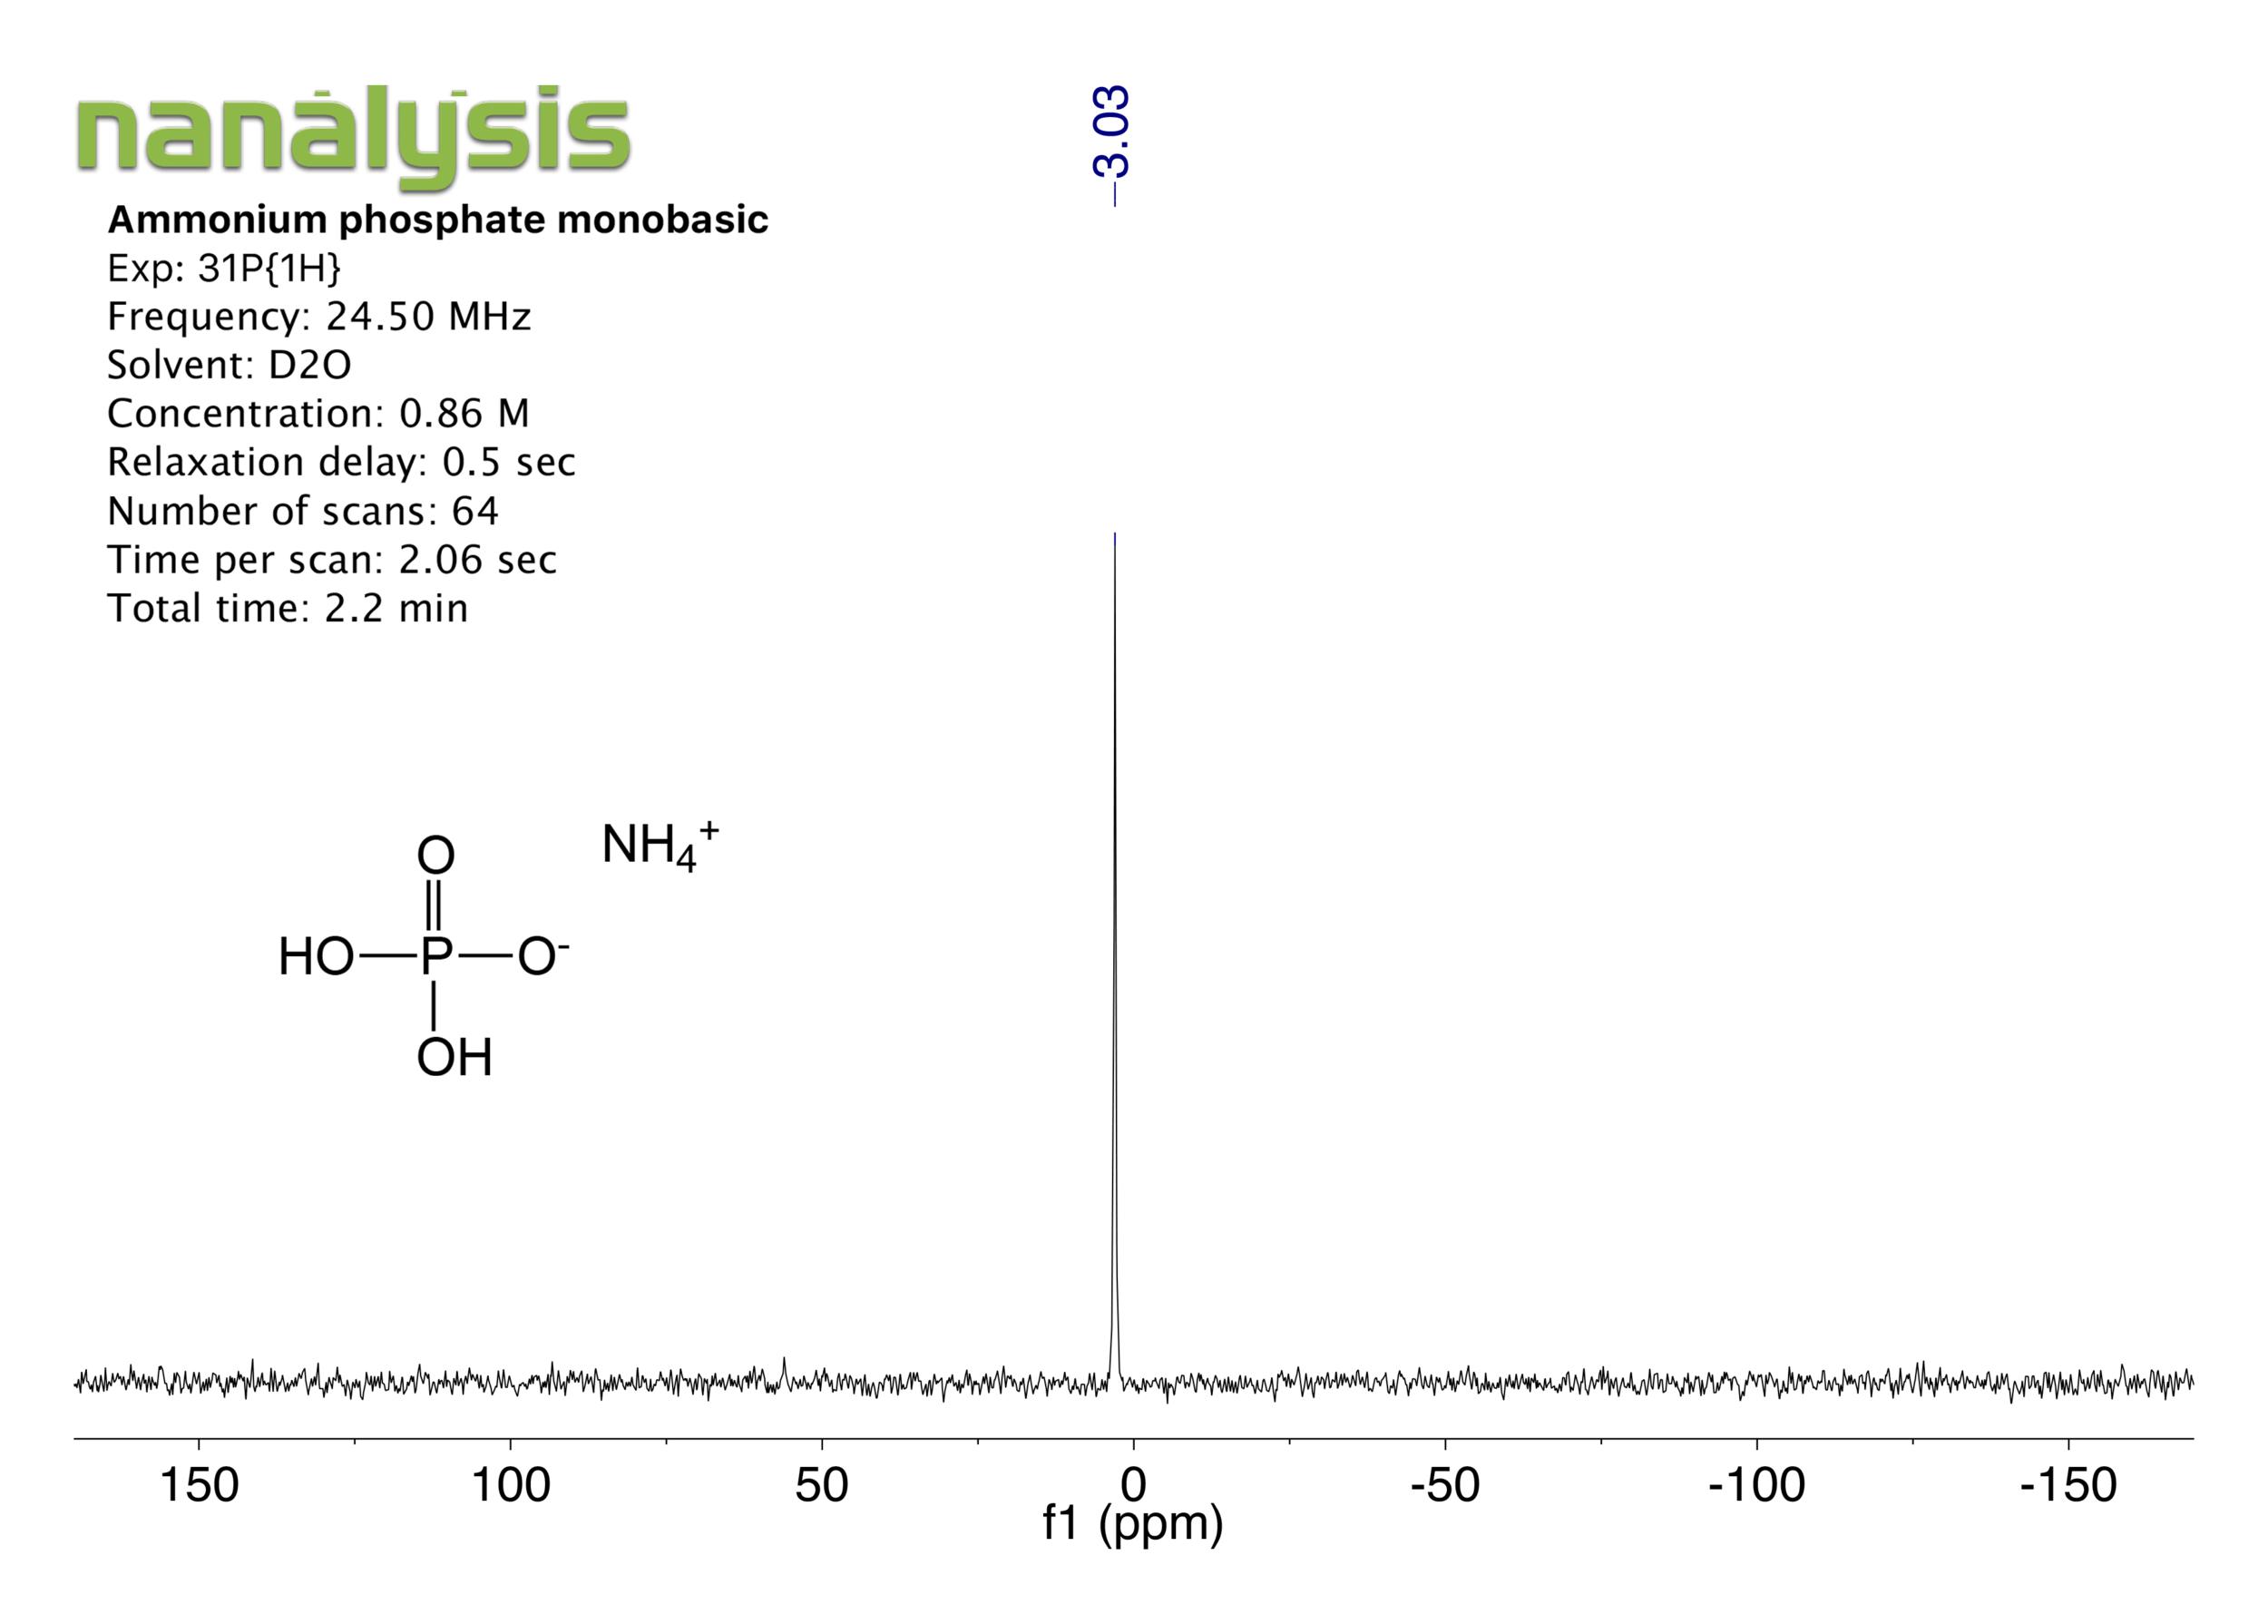 ammonium phosphate monobas_31P_benchtopNMR.png